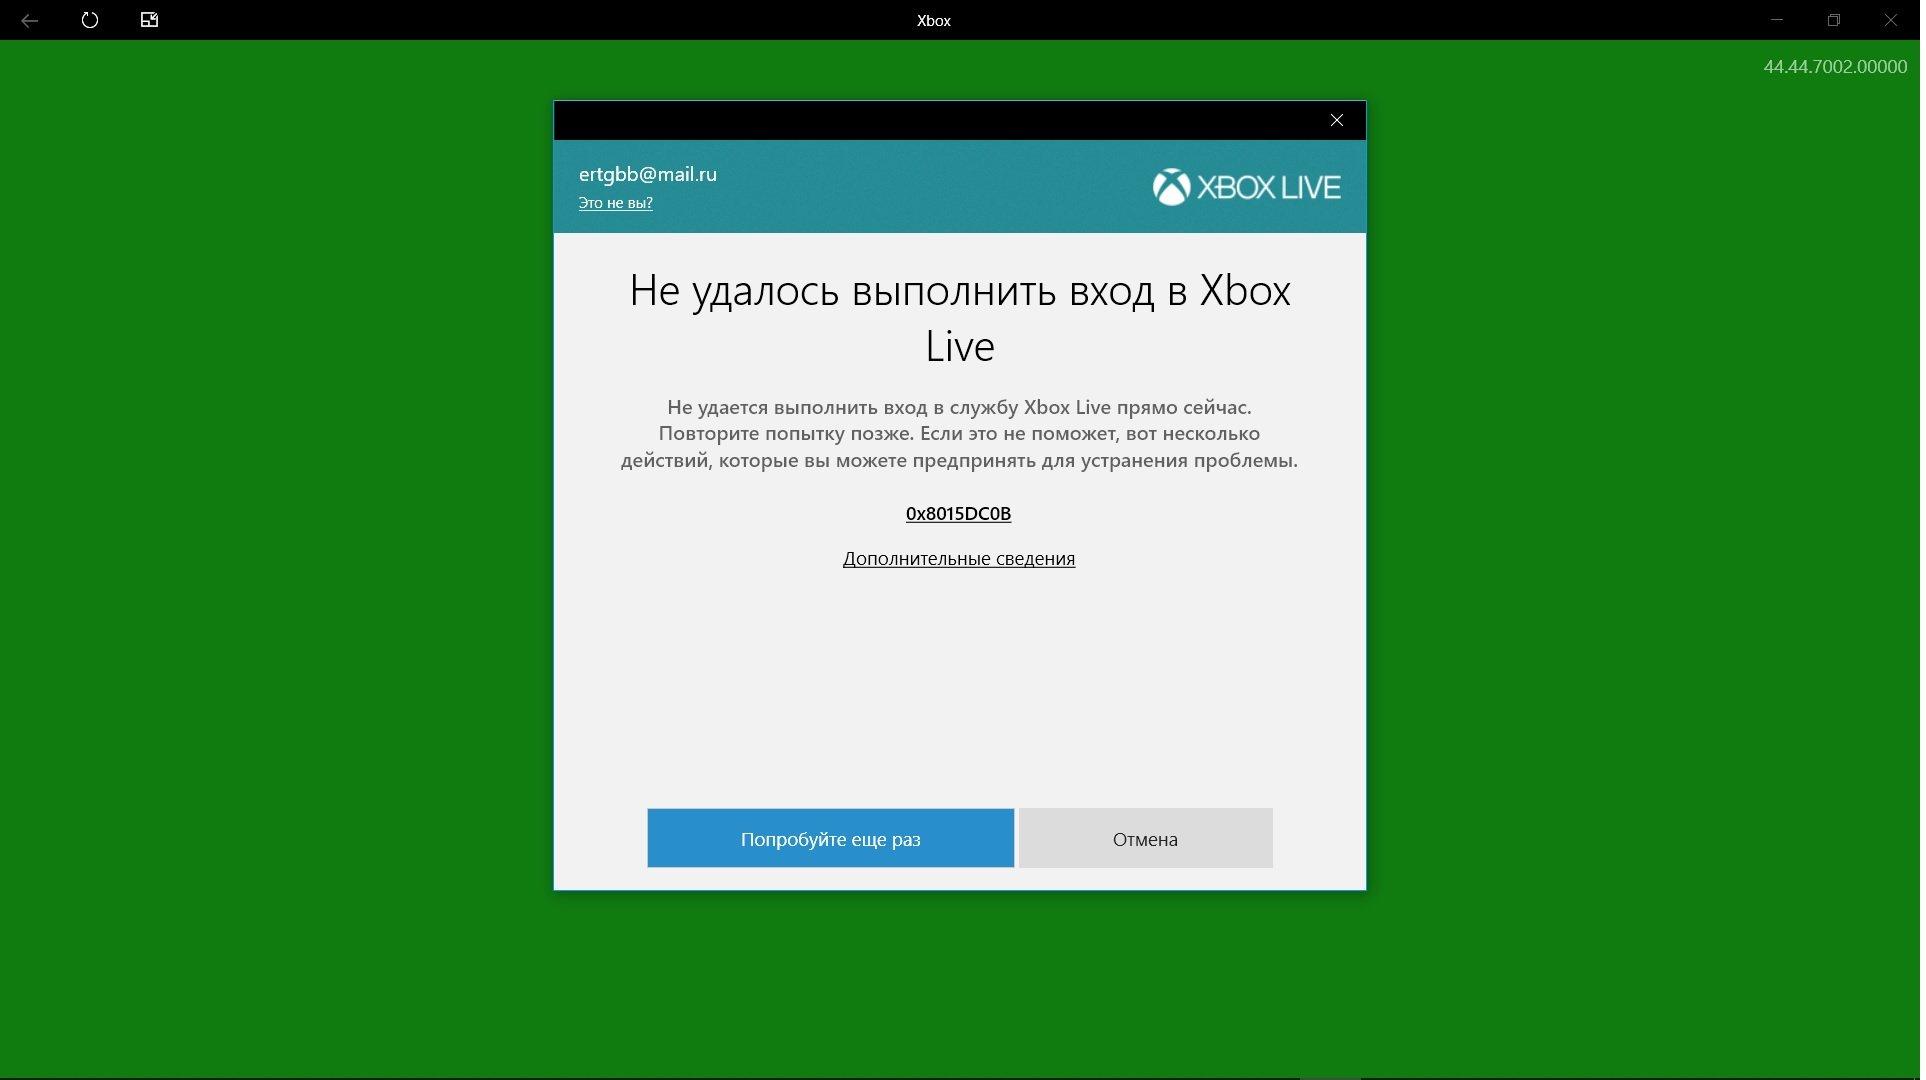 Help! I can not log into xbox live windows 10 error 0x8015DC0B a46e7d70-22f7-4d26-8076-11040181d642?upload=true.jpg